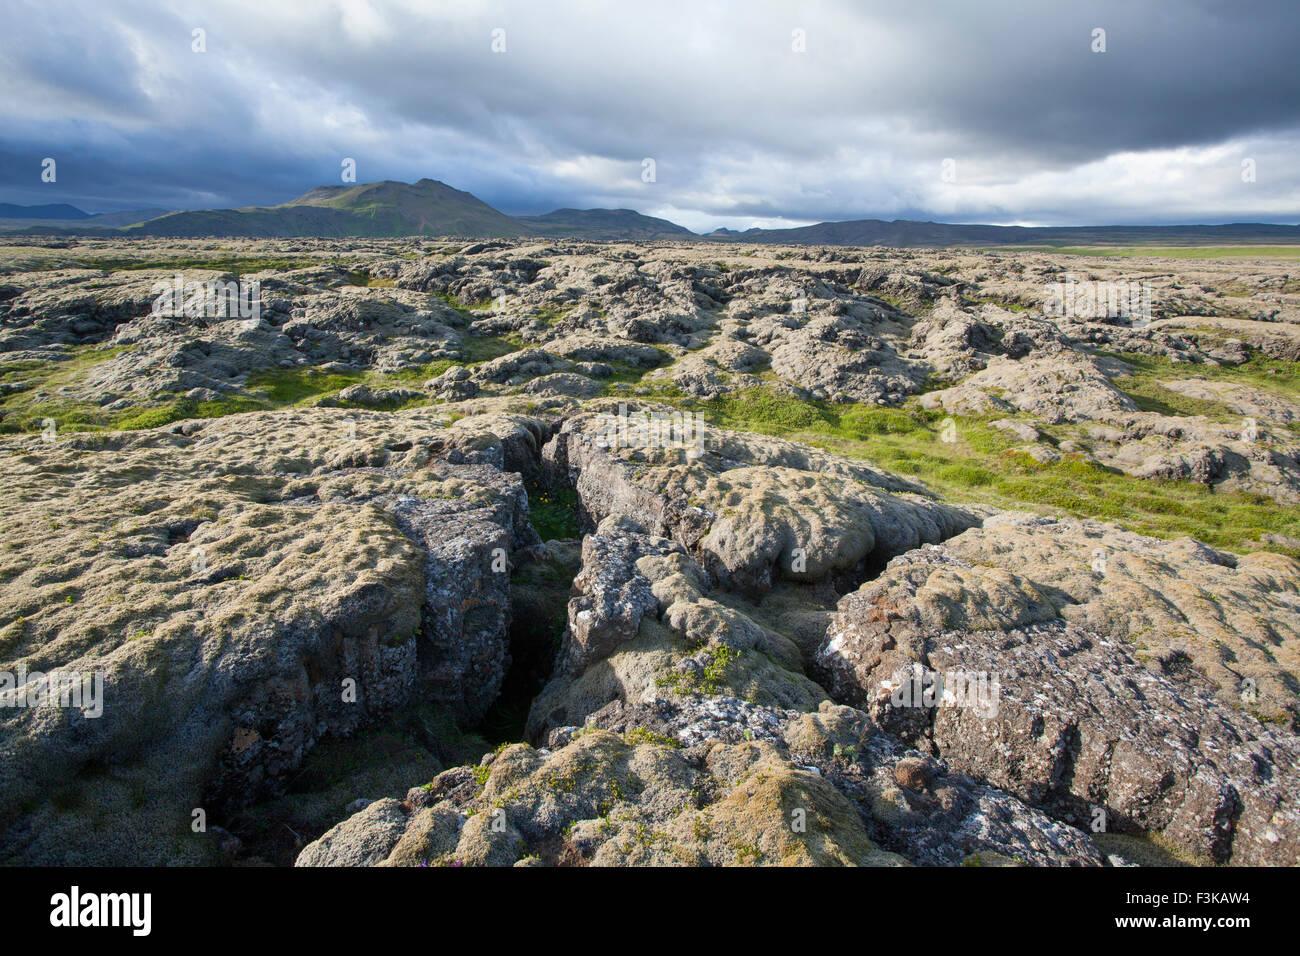 Moss-covered lava field near Hveragerdi, Sudherland, Iceland. Stock Photo